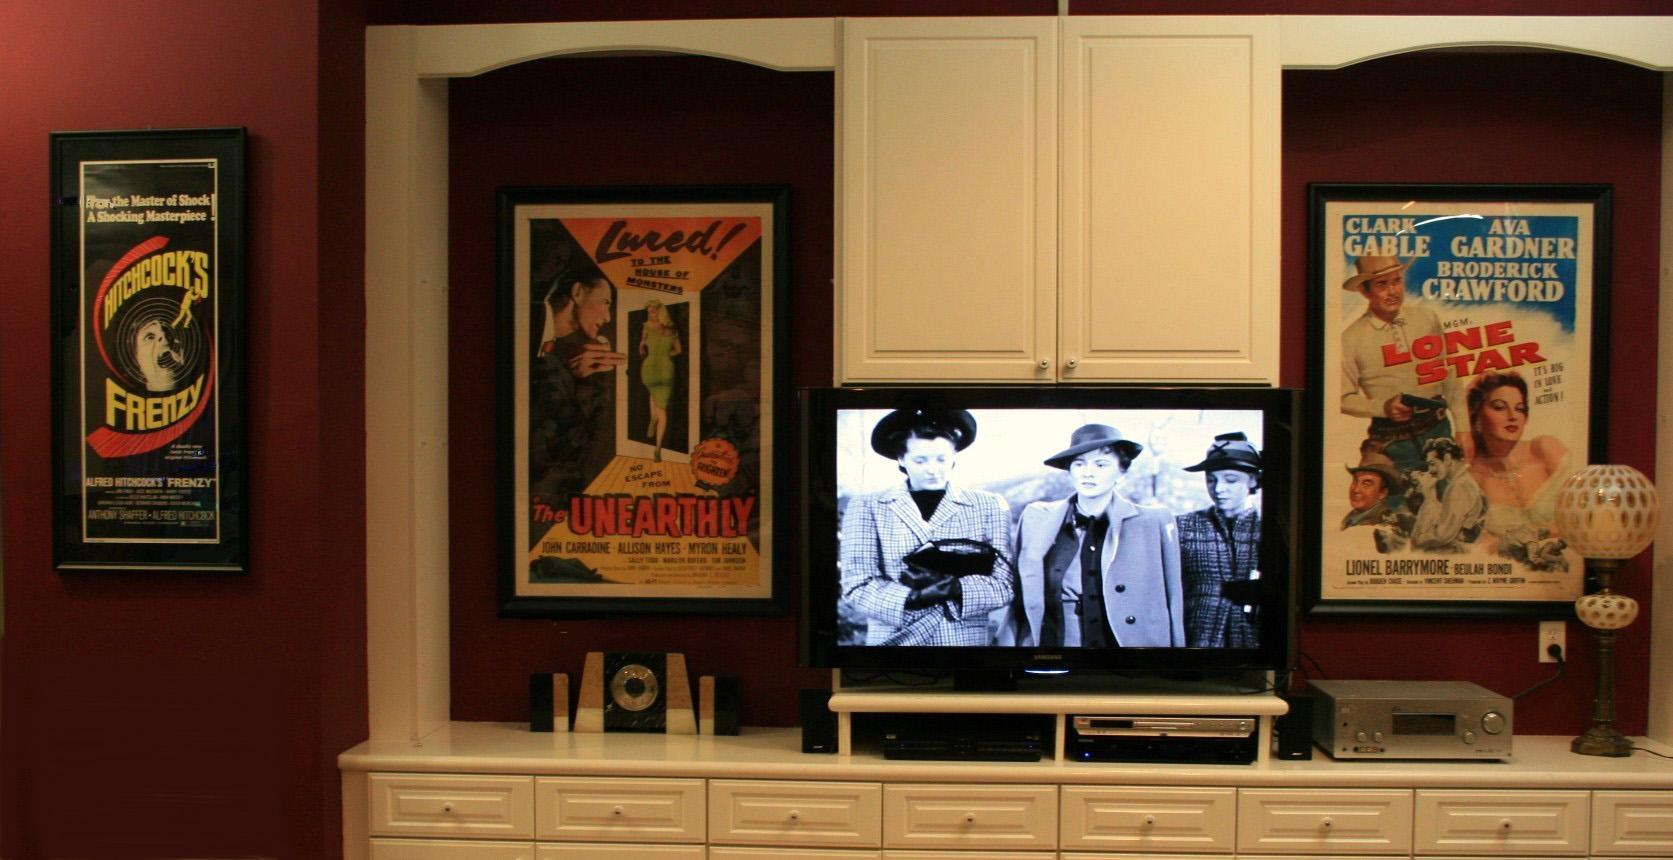 Media Room Movie Art Pertaining To Media Room Wall Art (Image 13 of 20)